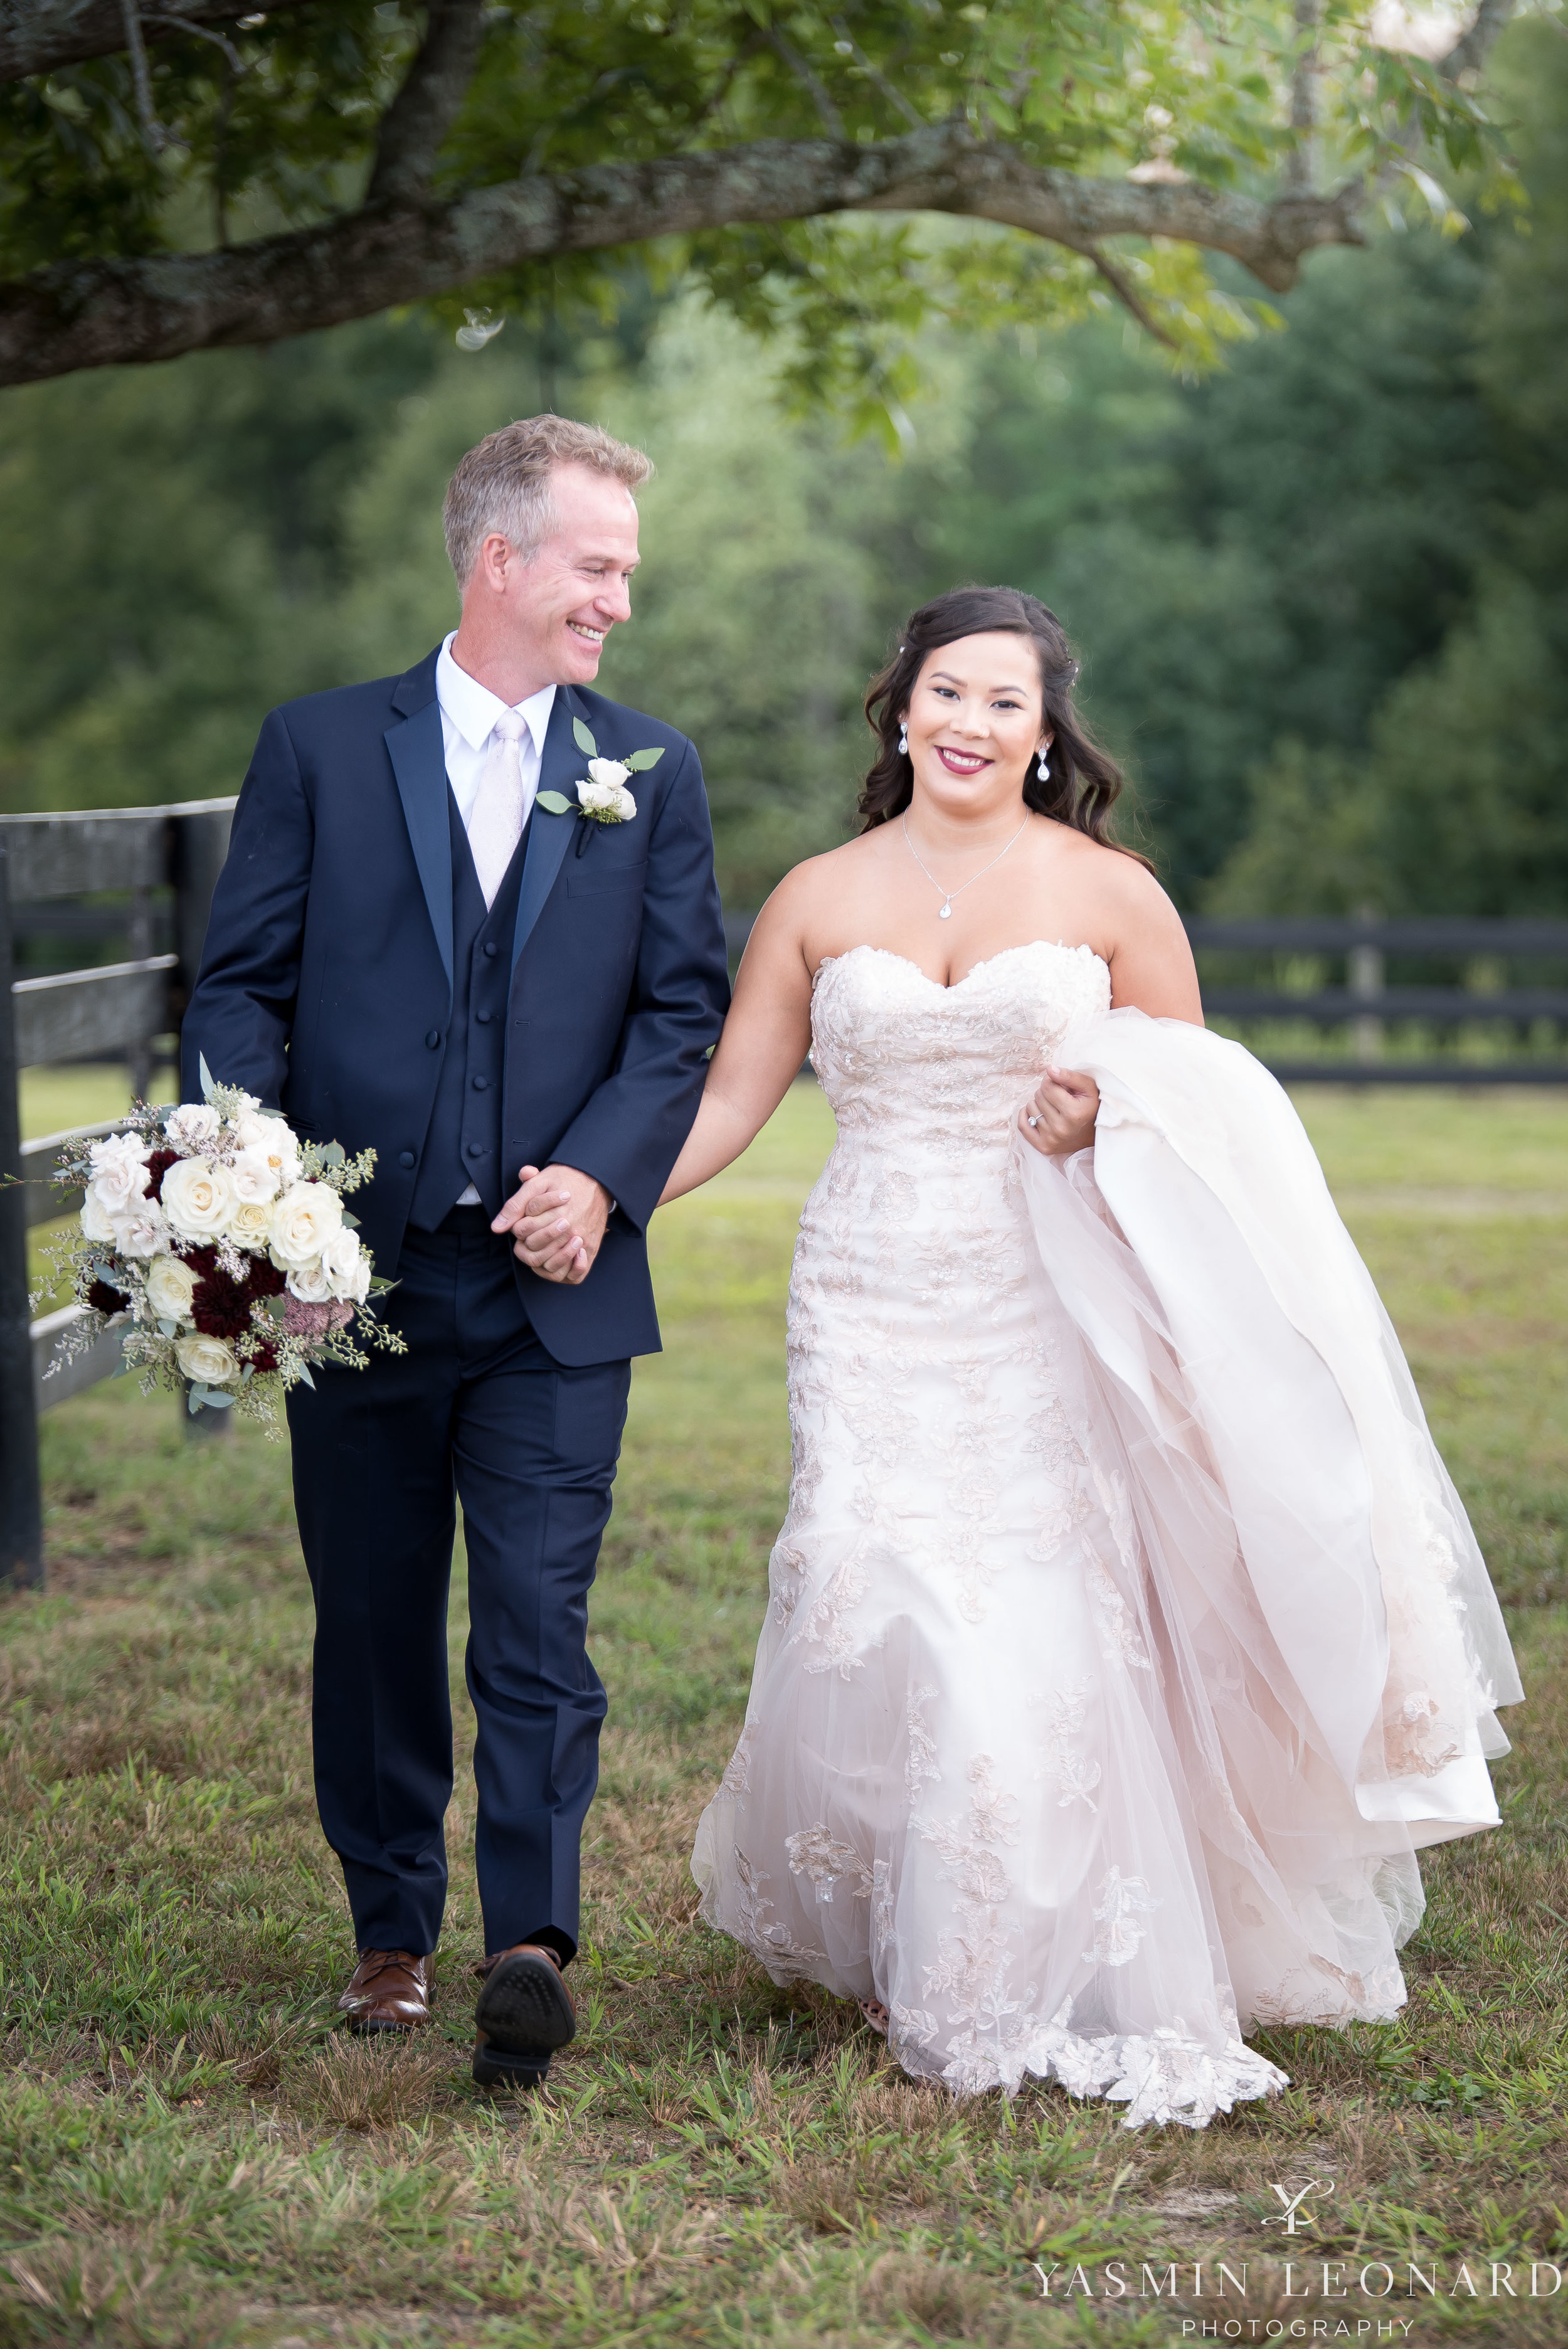 Mason Ridge   Liberty, NC   Aylissa and John   Yasmin Leonard Photography-47.jpg